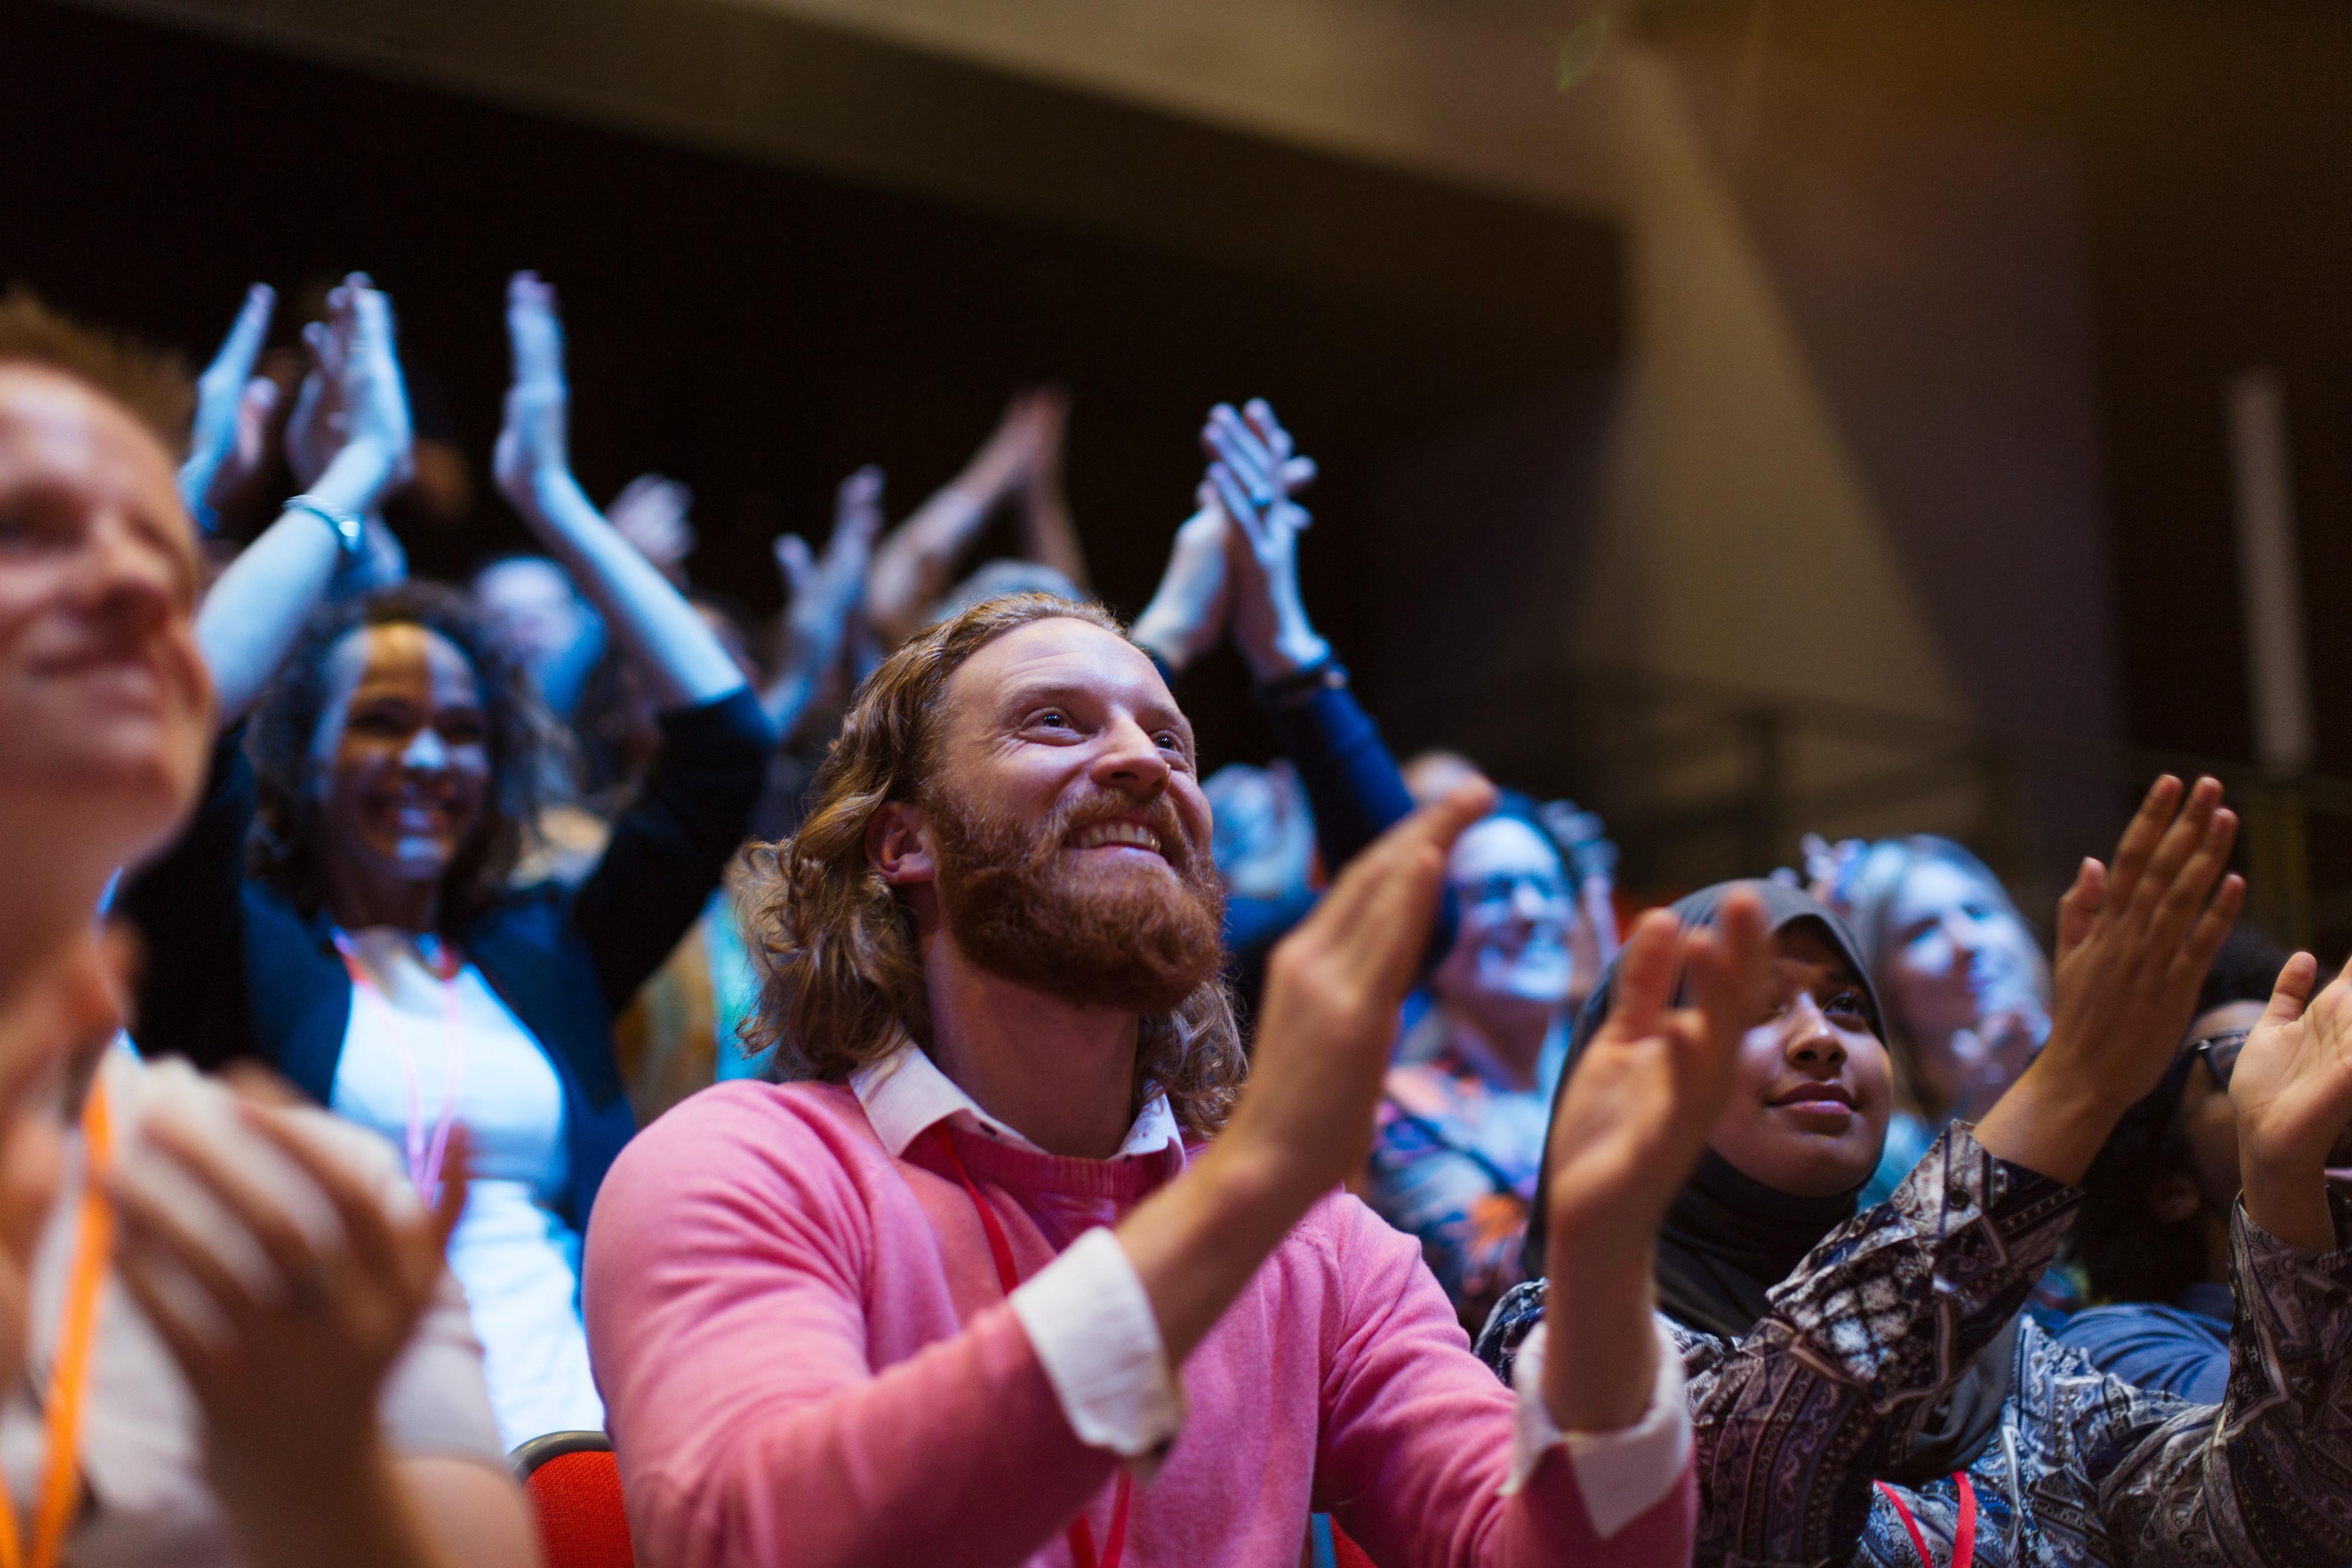 People clapping - Westgate Las Vegas